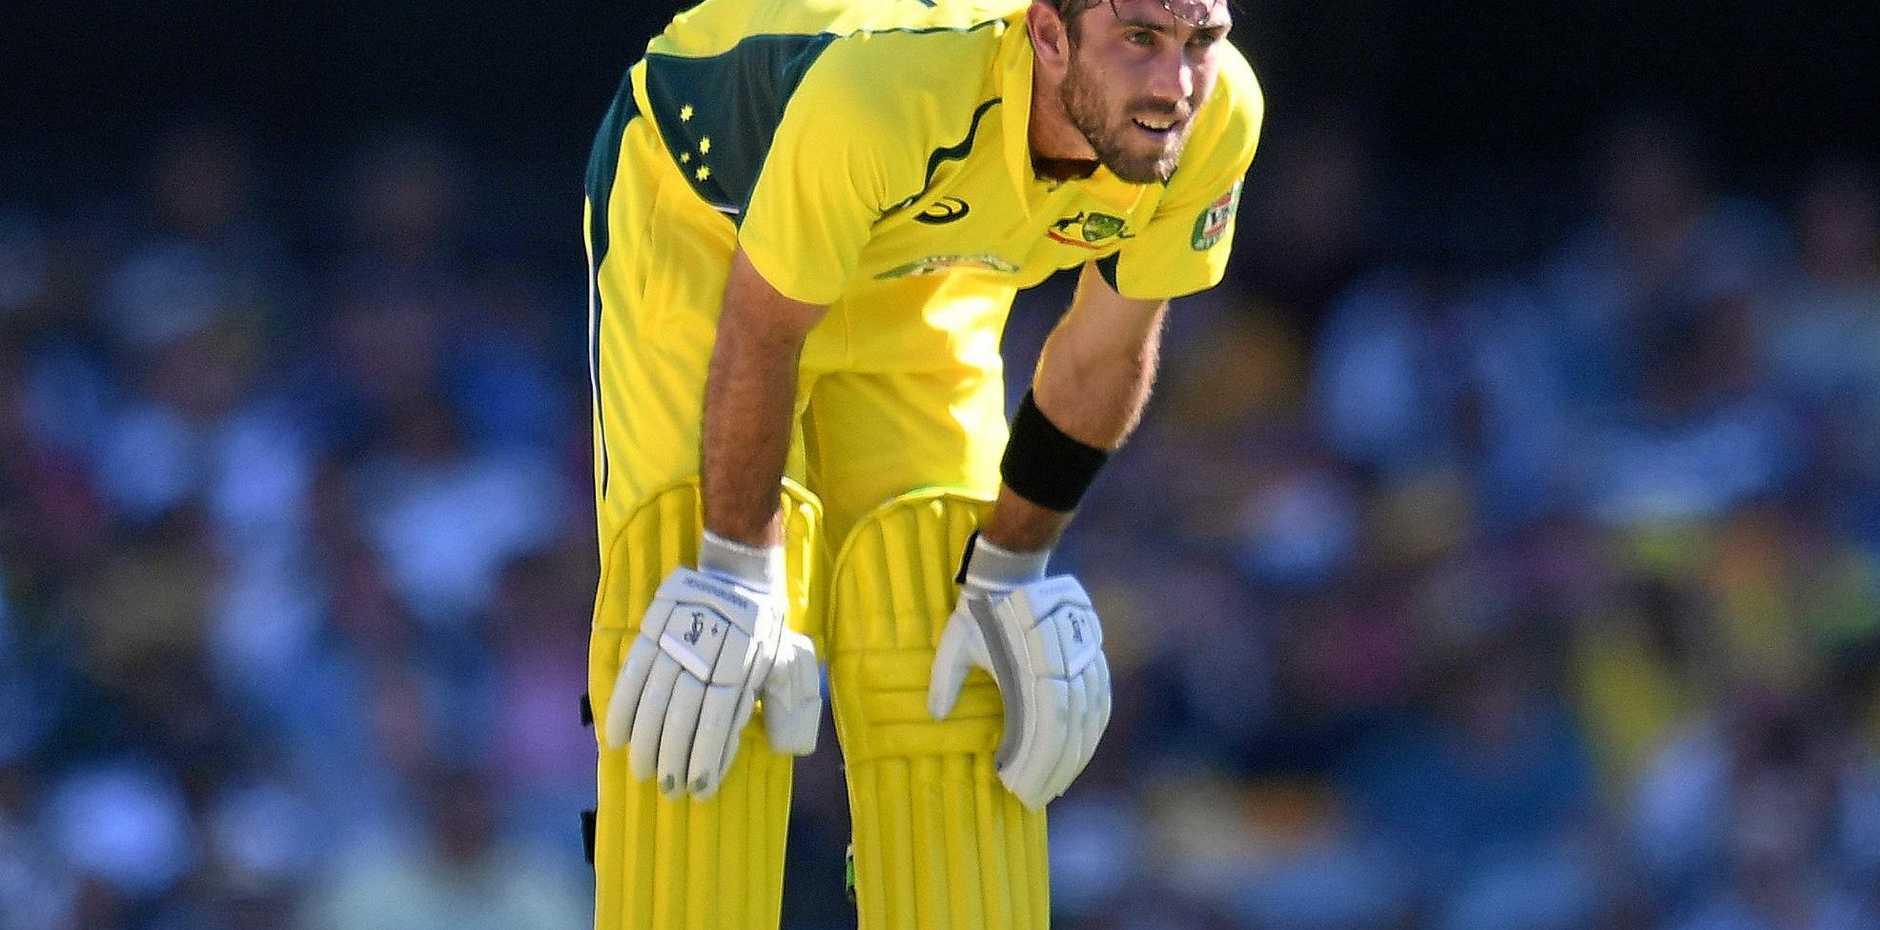 Australian batsman Glenn Maxwell during the one-day international against Pakistan at the Gabba.